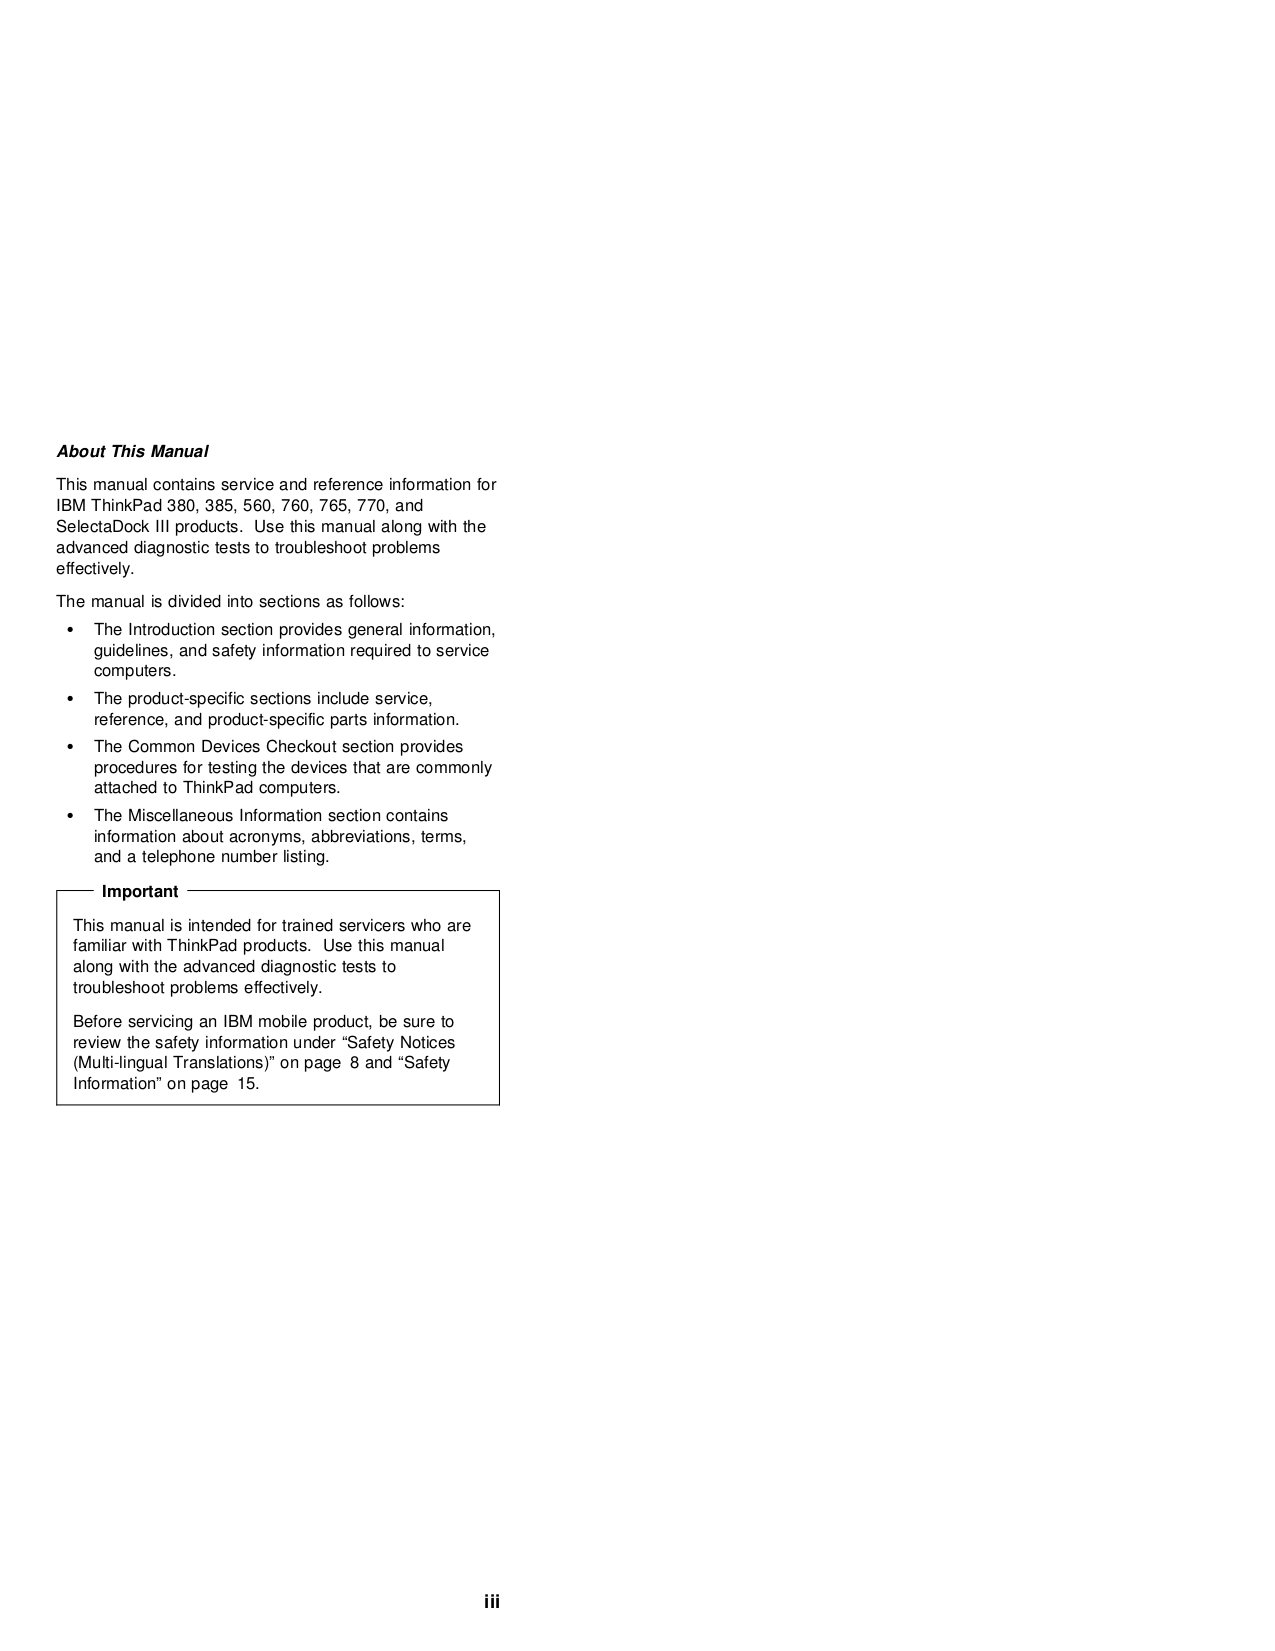 ... IBM Laptop ThinkPad 560P pdf page preview ...